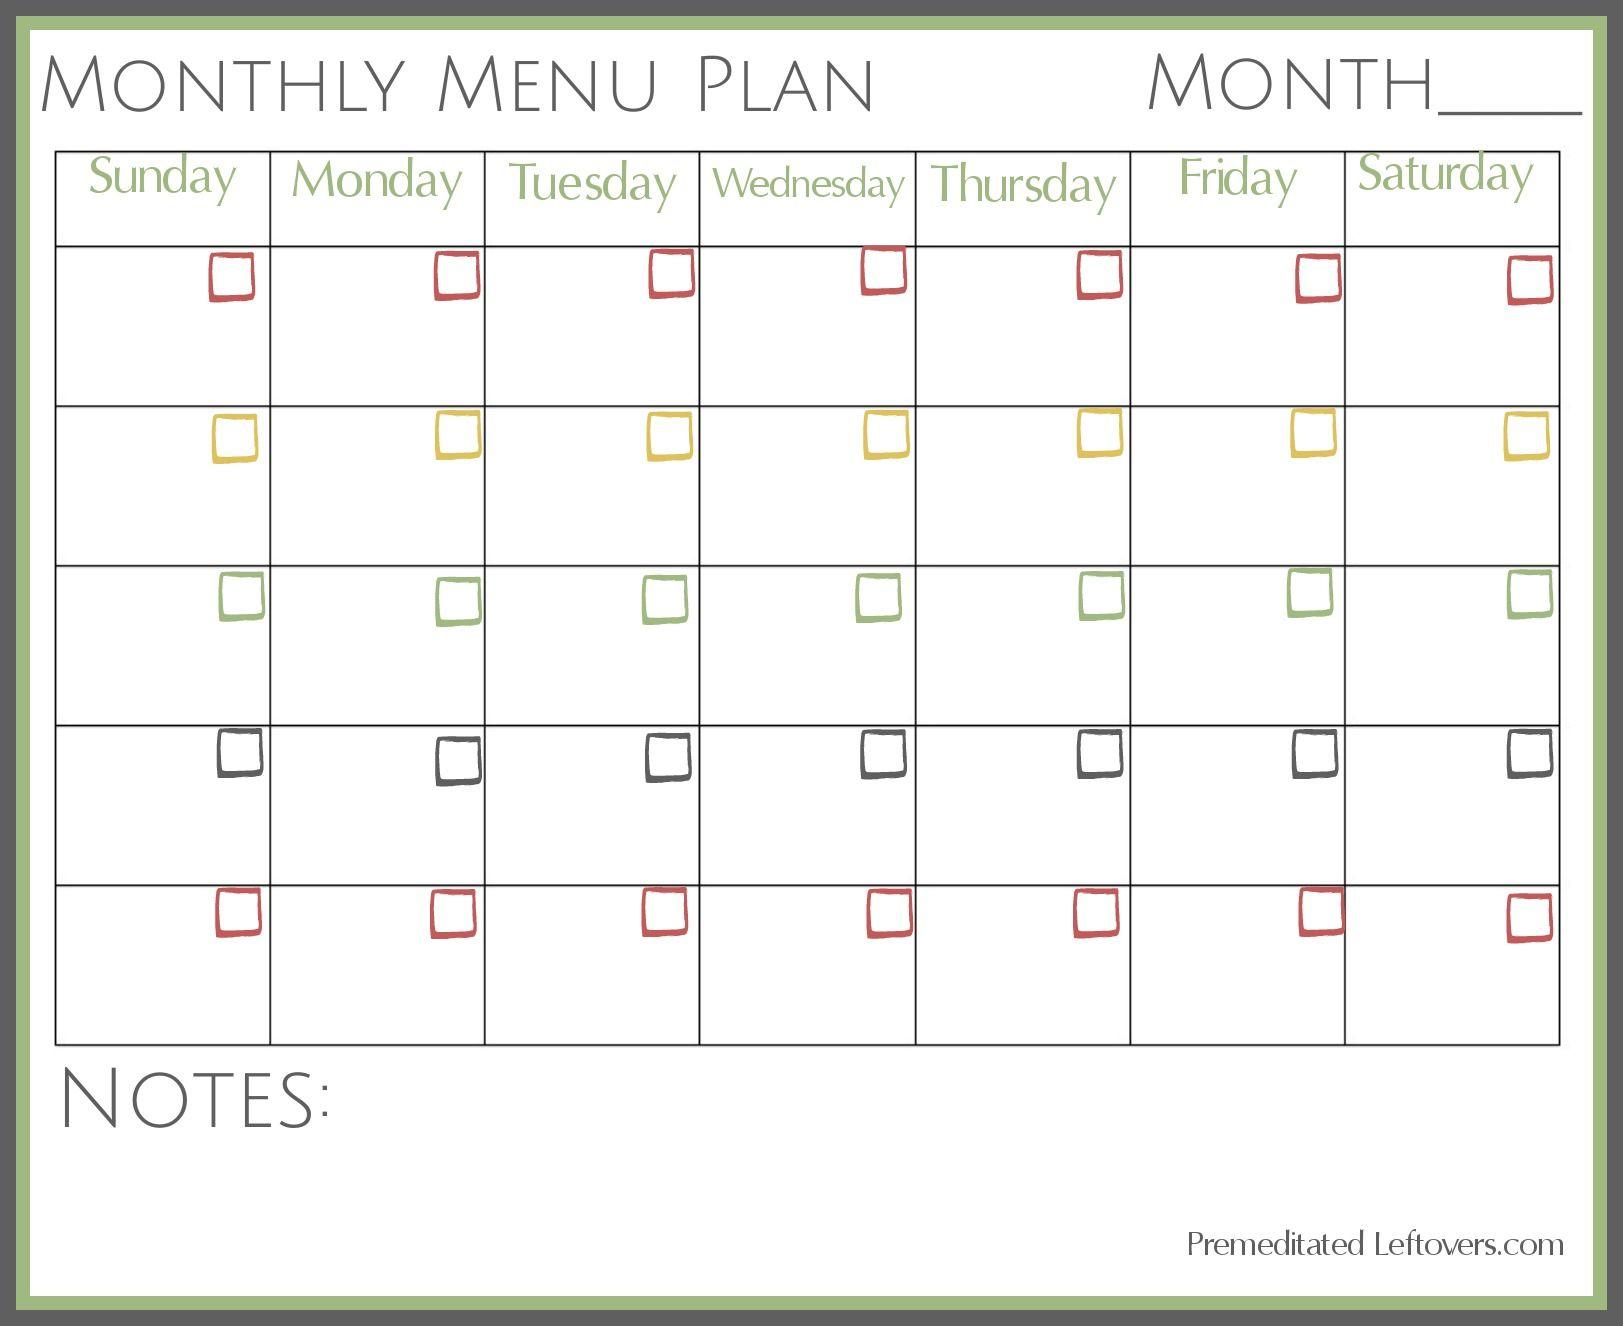 Free Printable Monthly Menu Plan   Printable Forms, Etc.   Pinterest - Free Printable Monthly Meal Planner